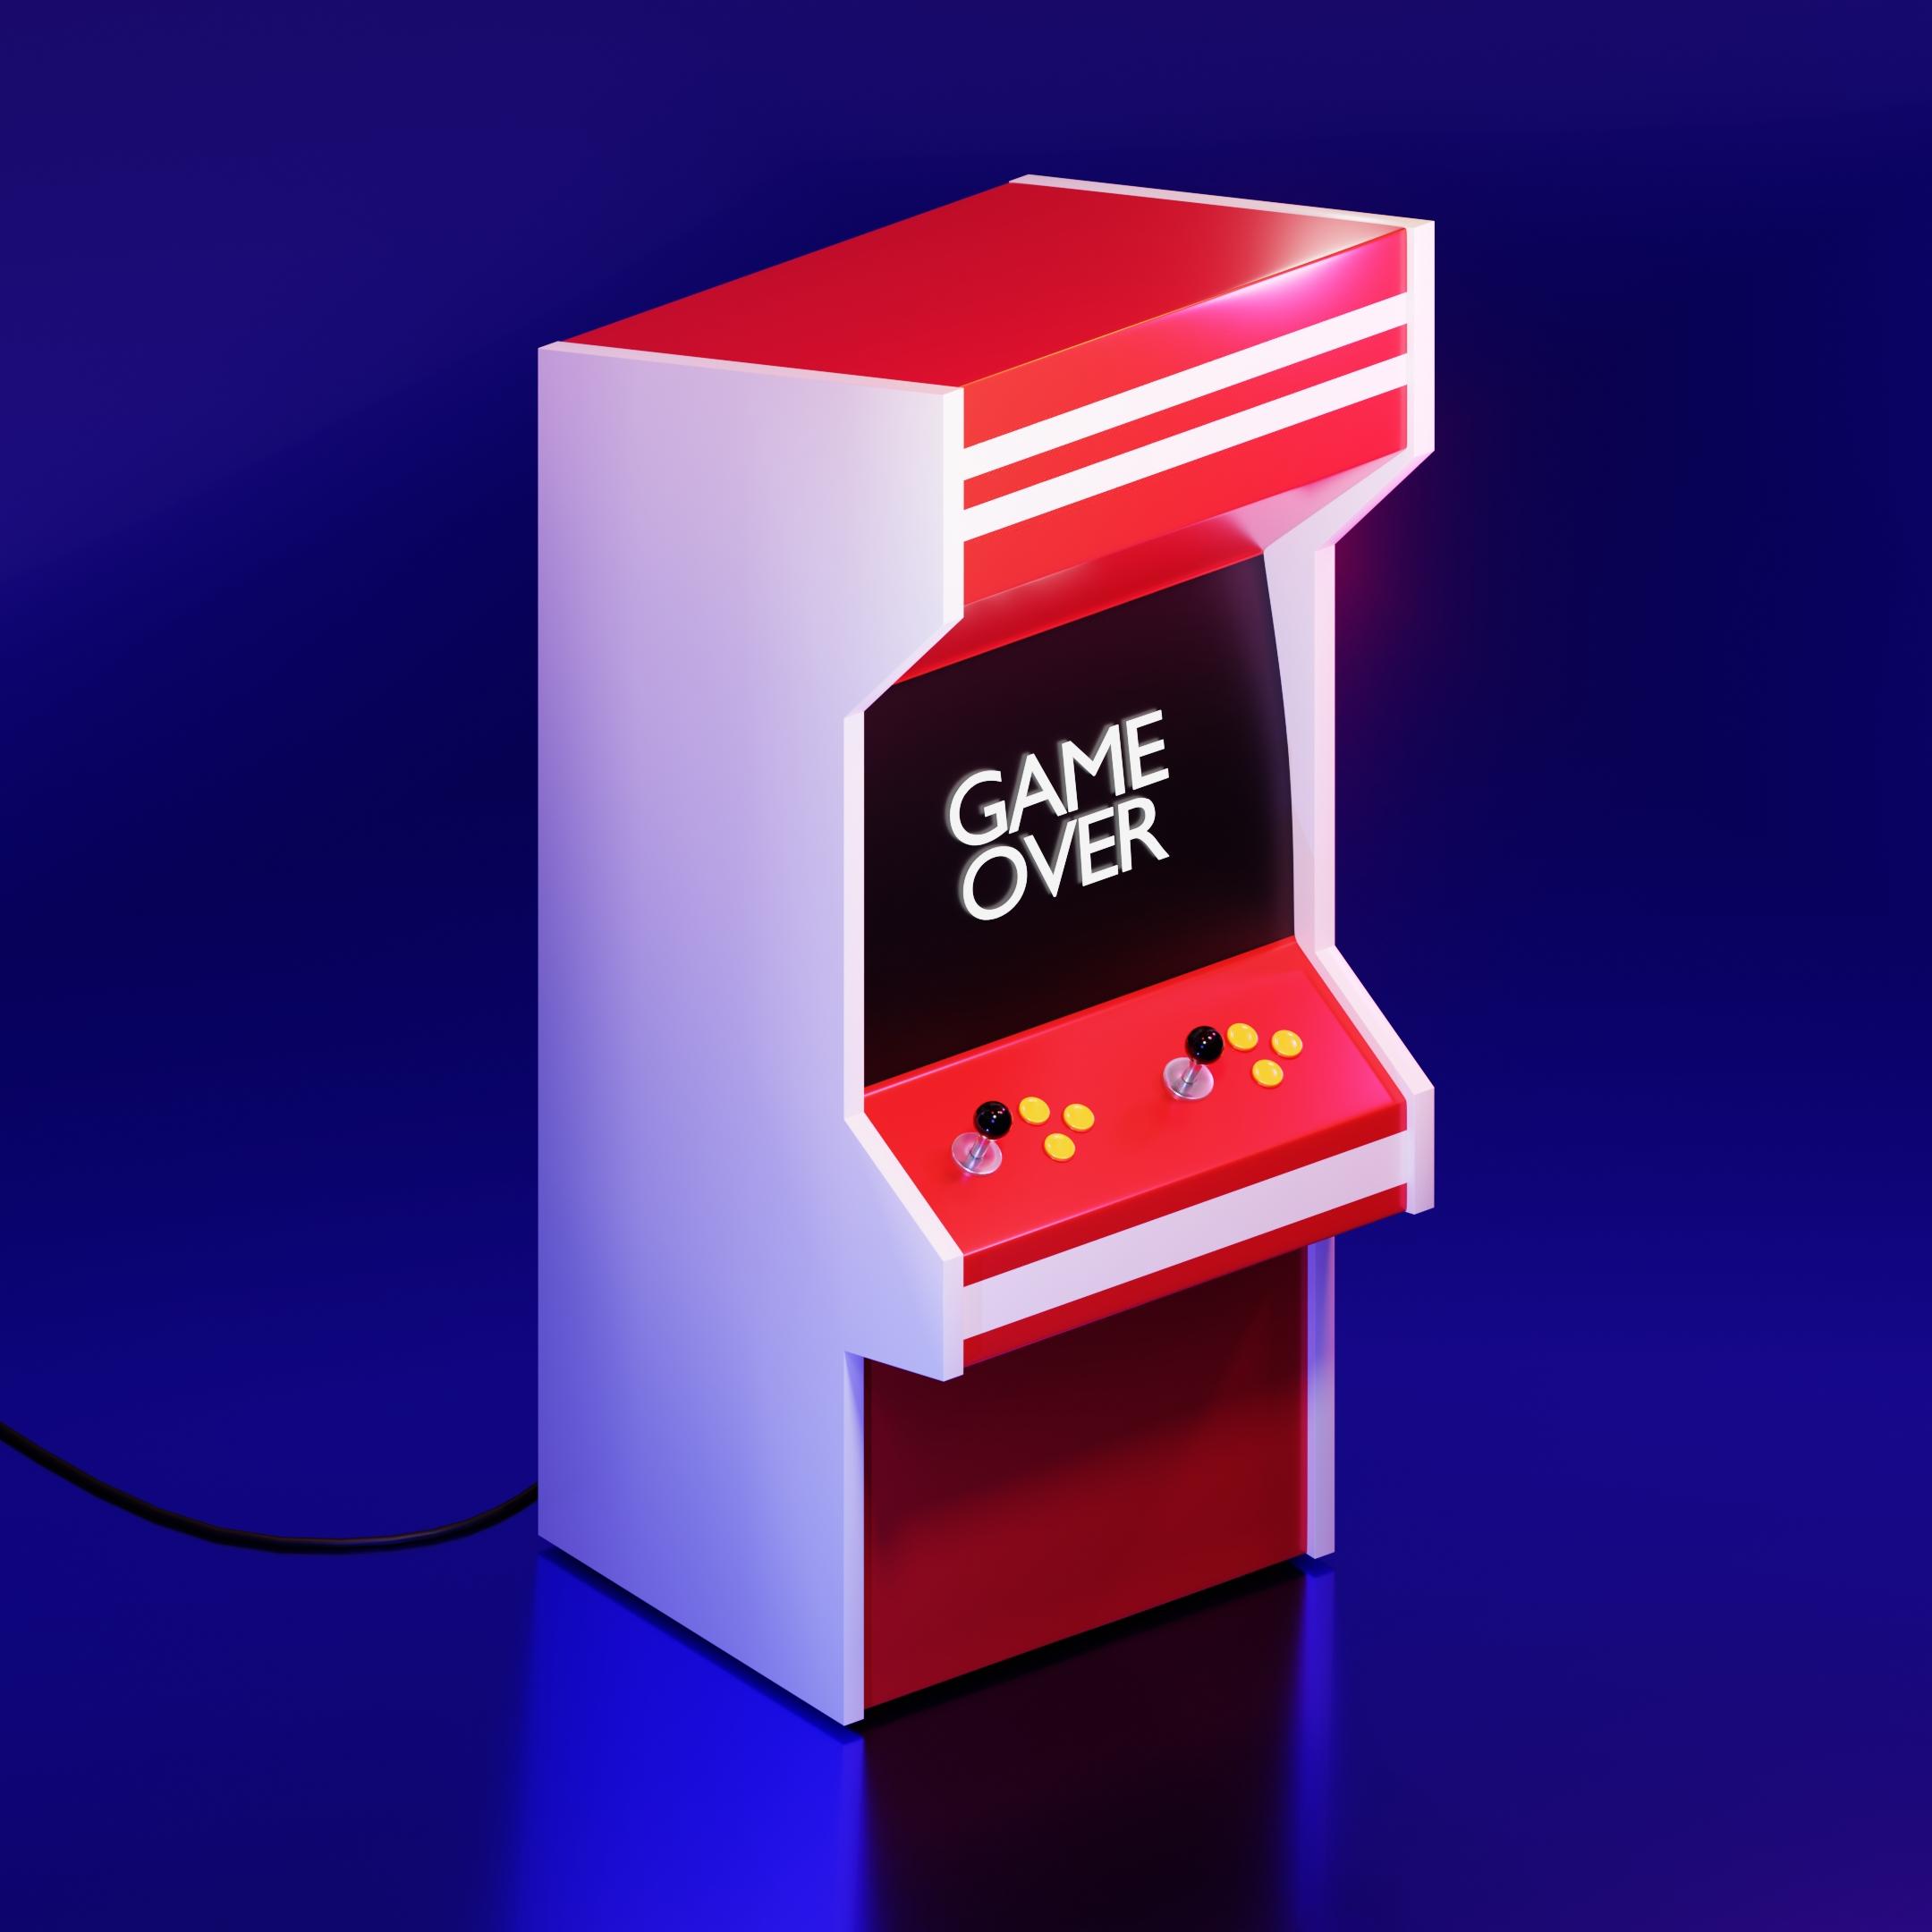 Projekt modelu 3D (Arcade Game) automatu do gier Blender w kolorze